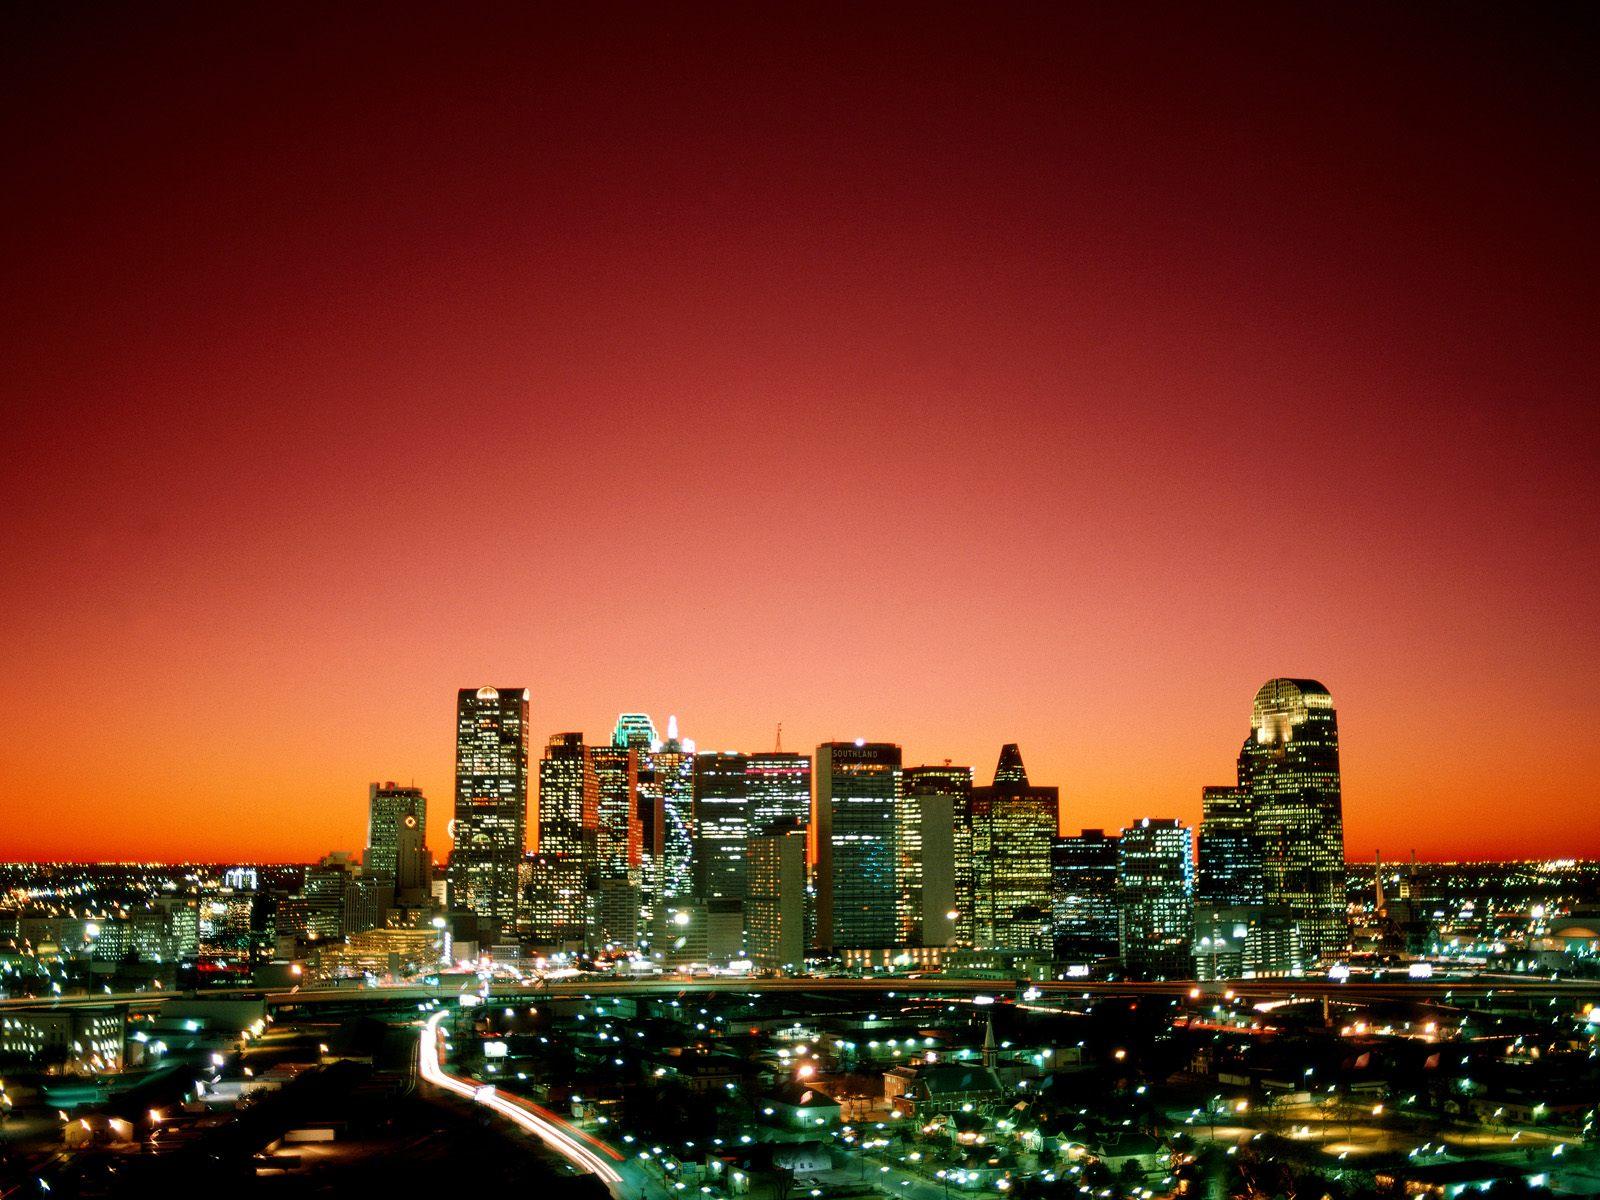 free download desktop night cityscape wallpapers night